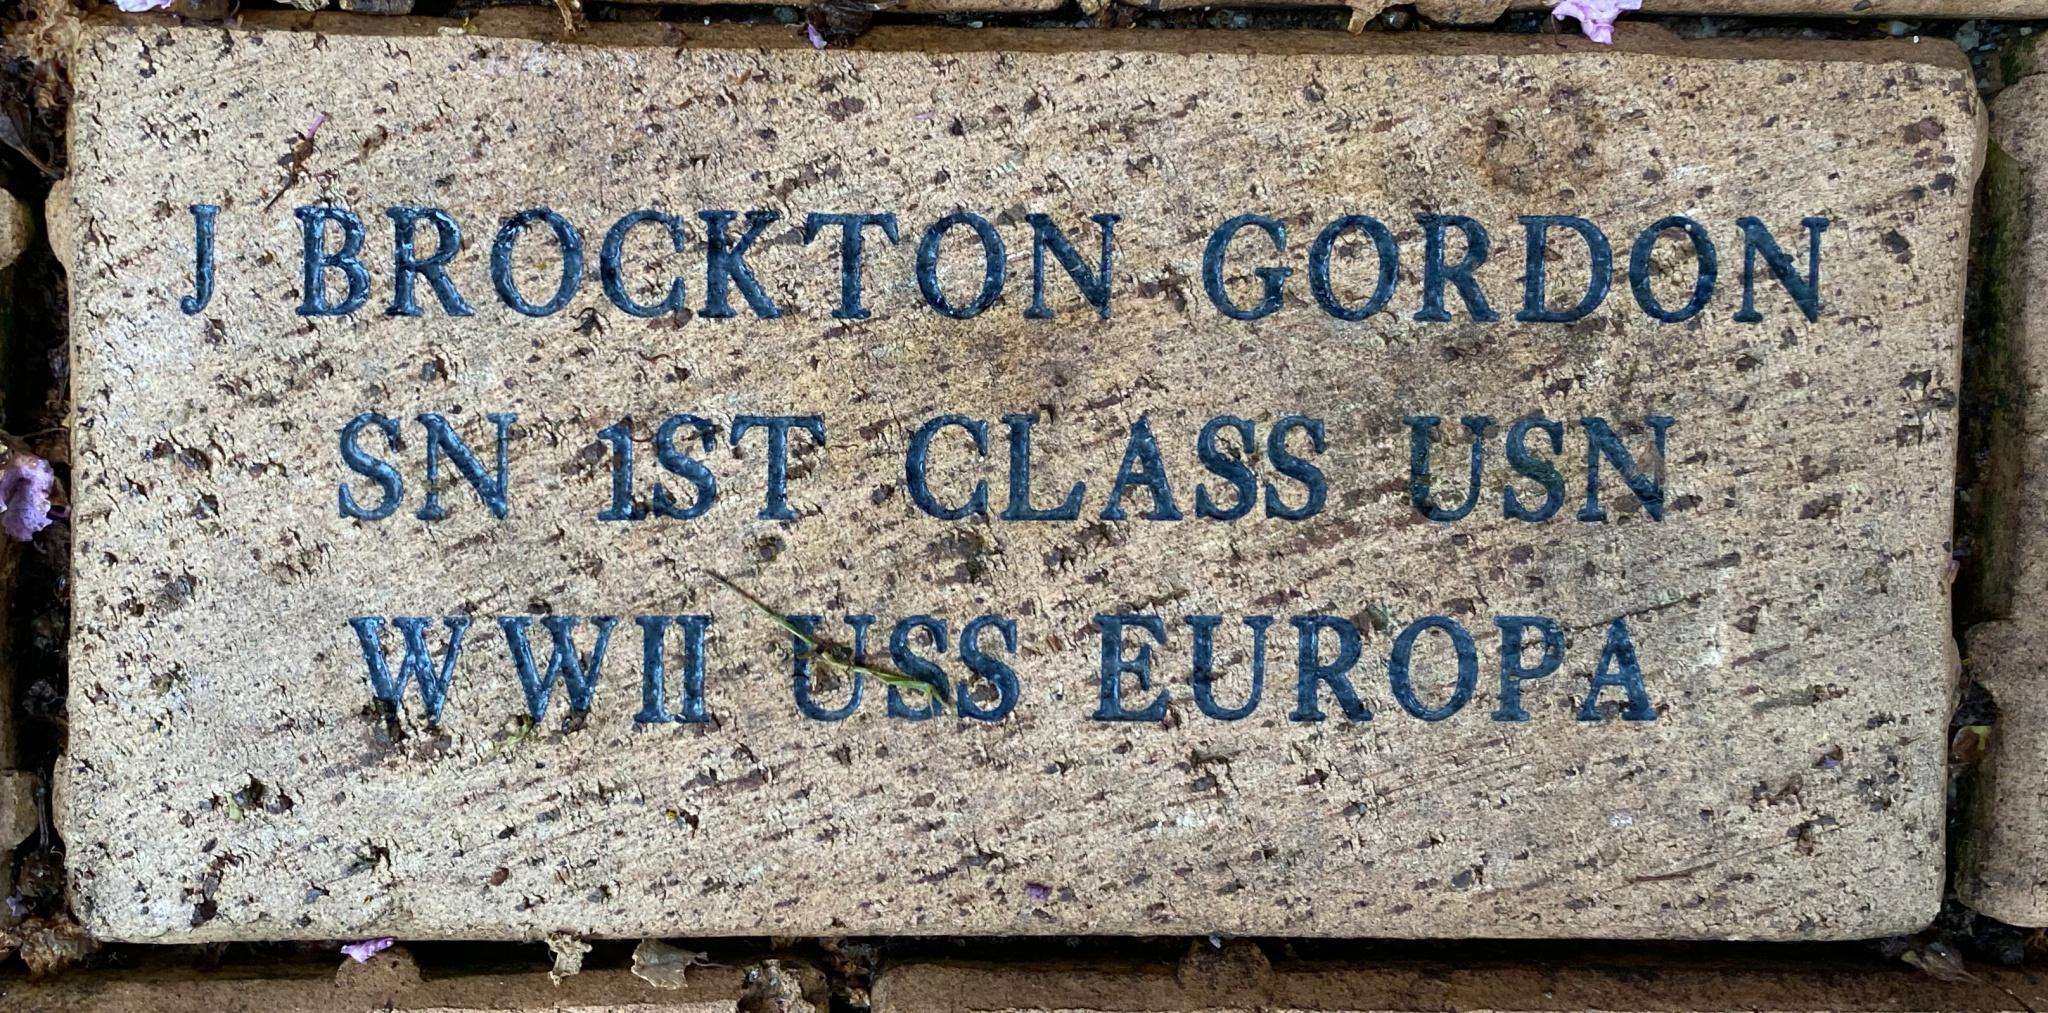 J BROCKTON GORDON SN 1ST CLASS USN WWII USS EUROPA